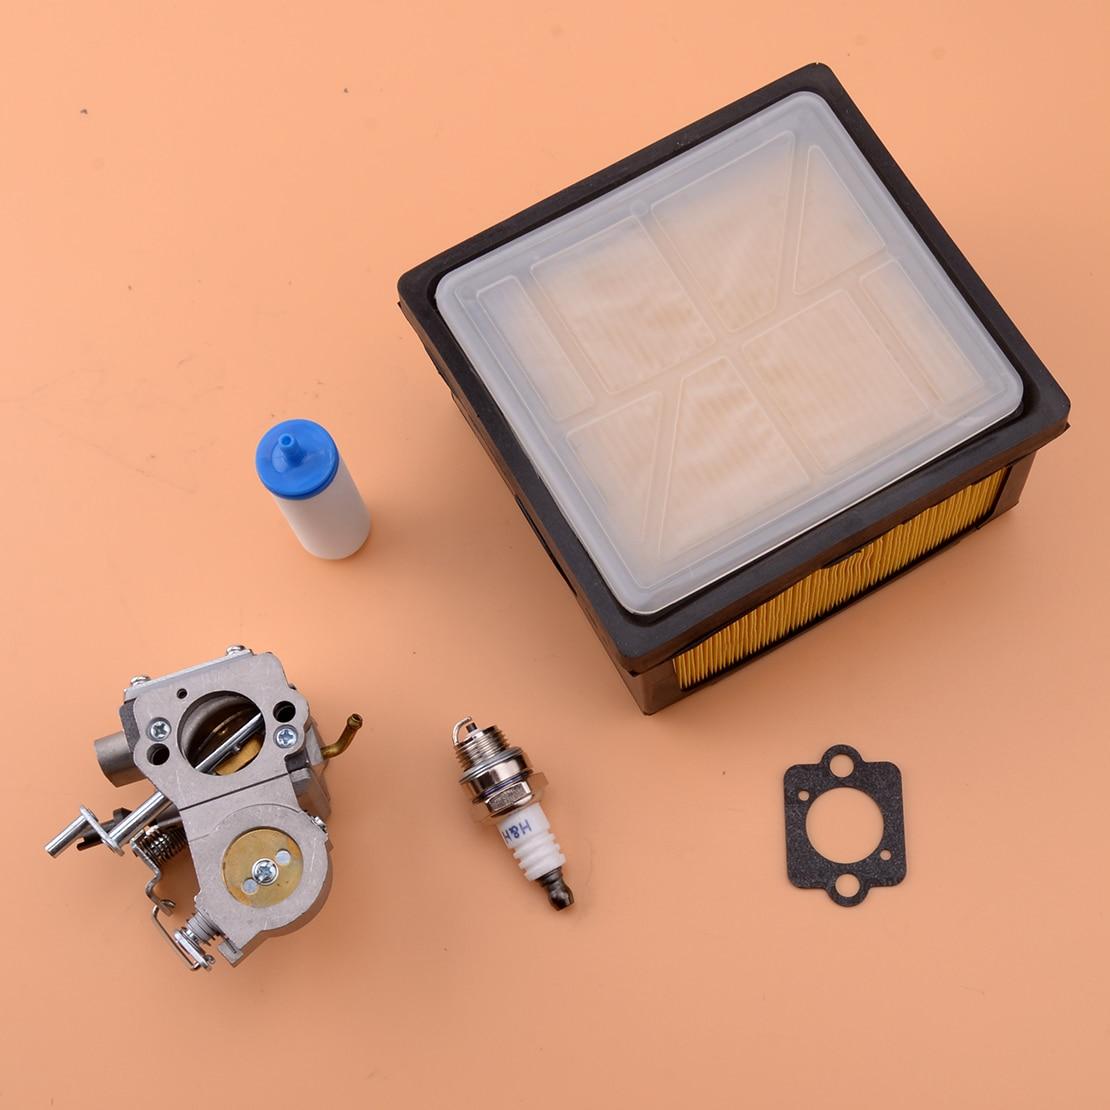 5pcs Carburetor Air Fuel Filter Kit Fit for Husqvarna Partner K750 K760 Chainsaw ZAMA C3-EL53 503 28 32 09 503-28-32-09